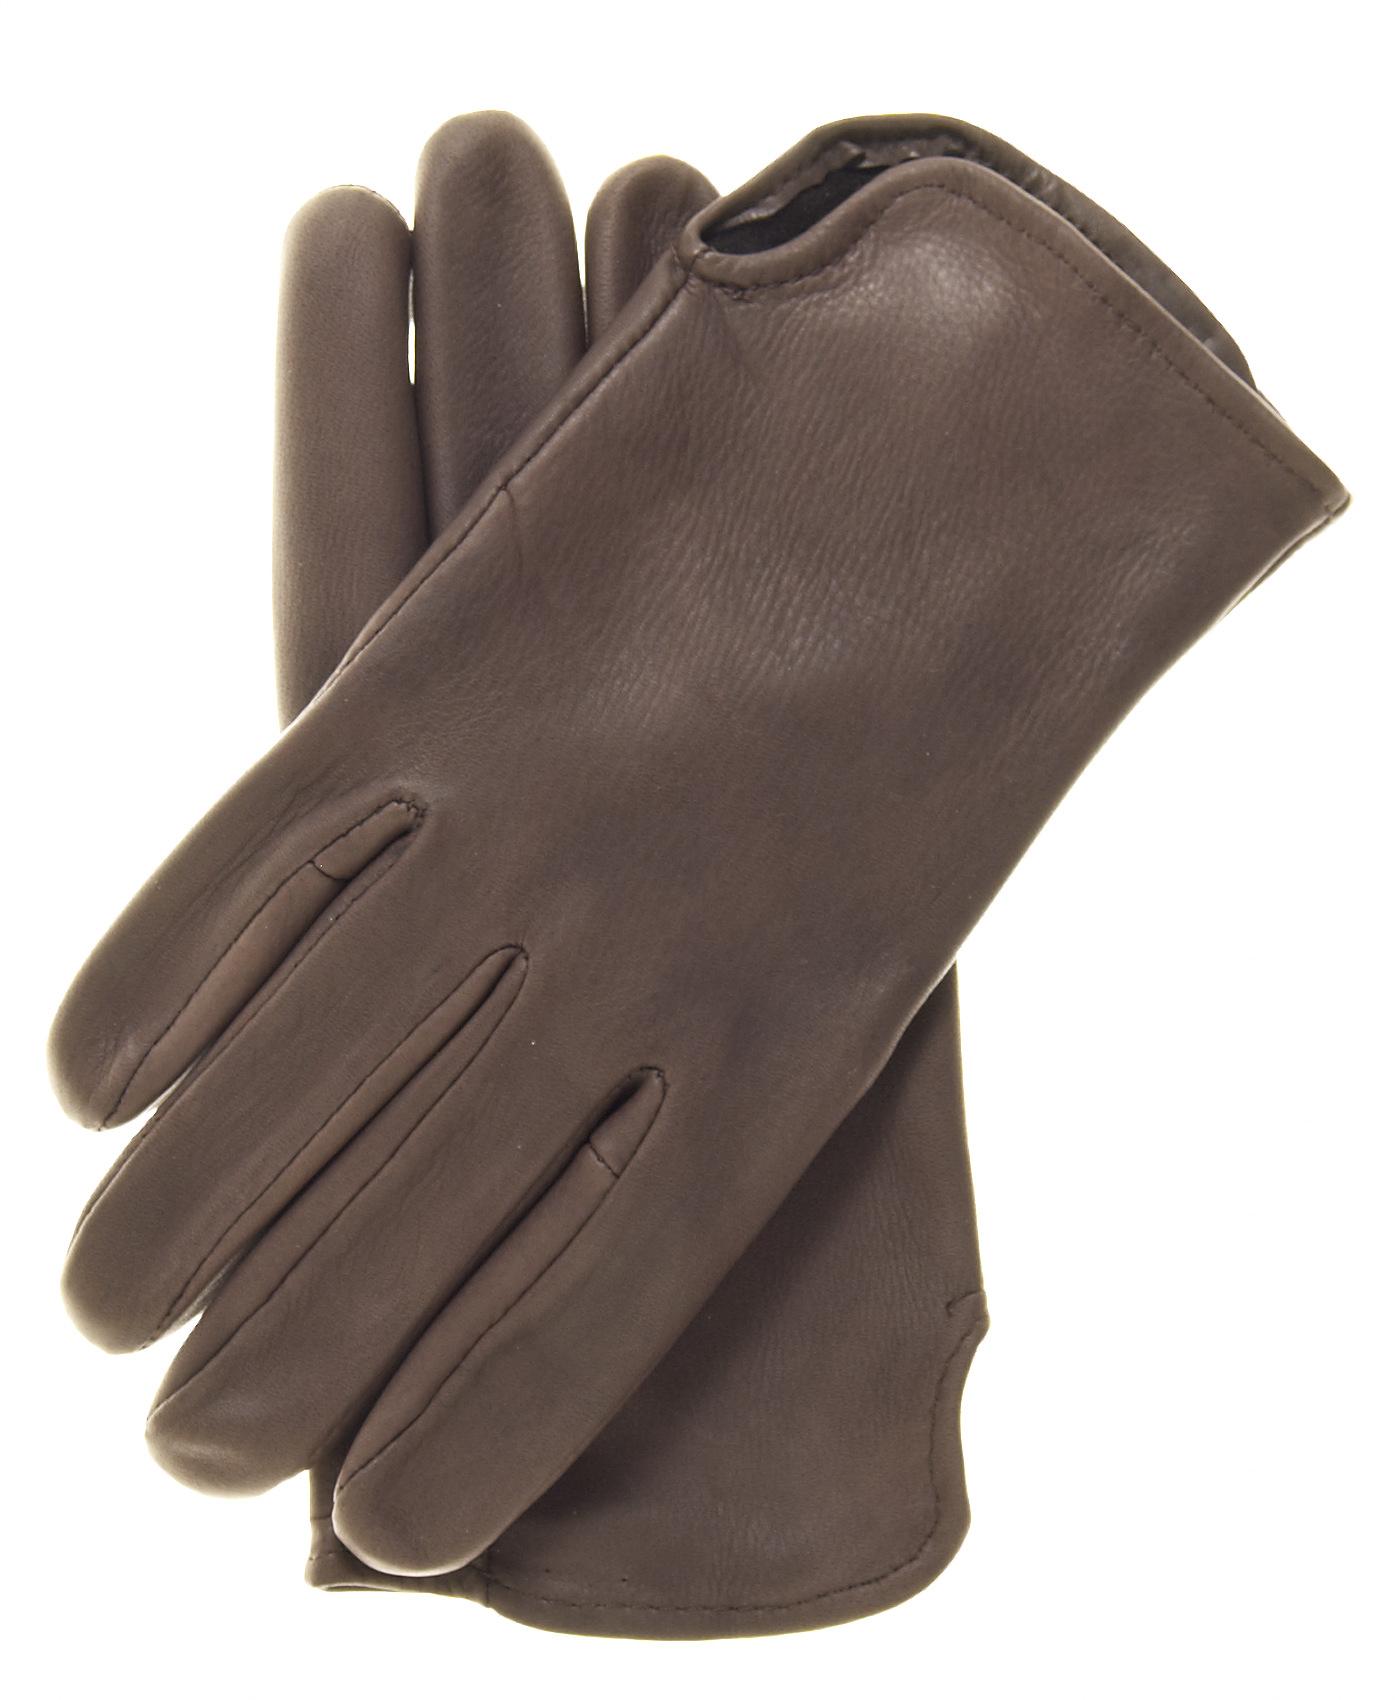 Geier Glove Men's Deerskin Gloves